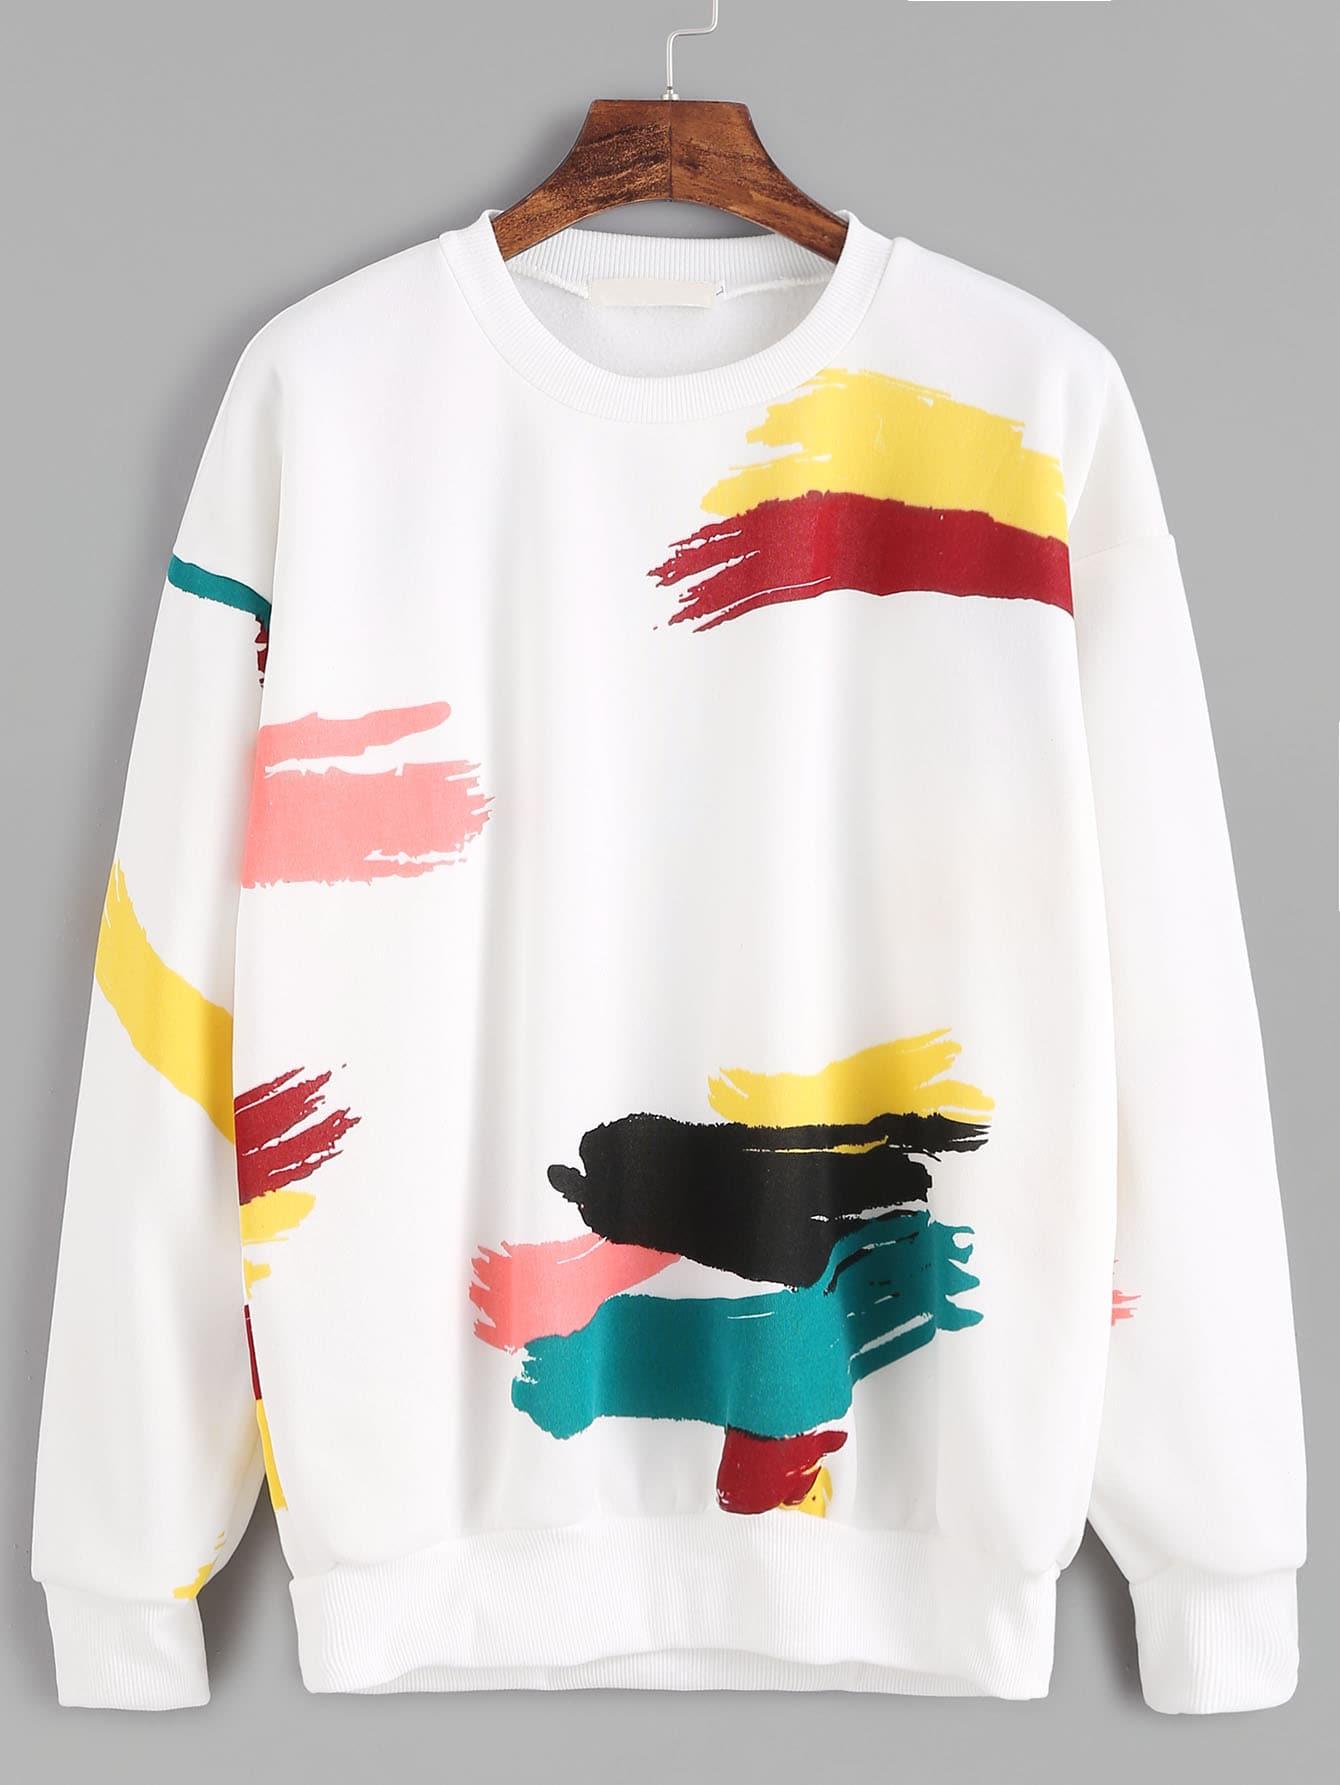 White Random Print Drop Shoulder Seam SweatshirtWhite Random Print Drop Shoulder Seam Sweatshirt<br><br>color: White<br>size: L,M,XL,XXL